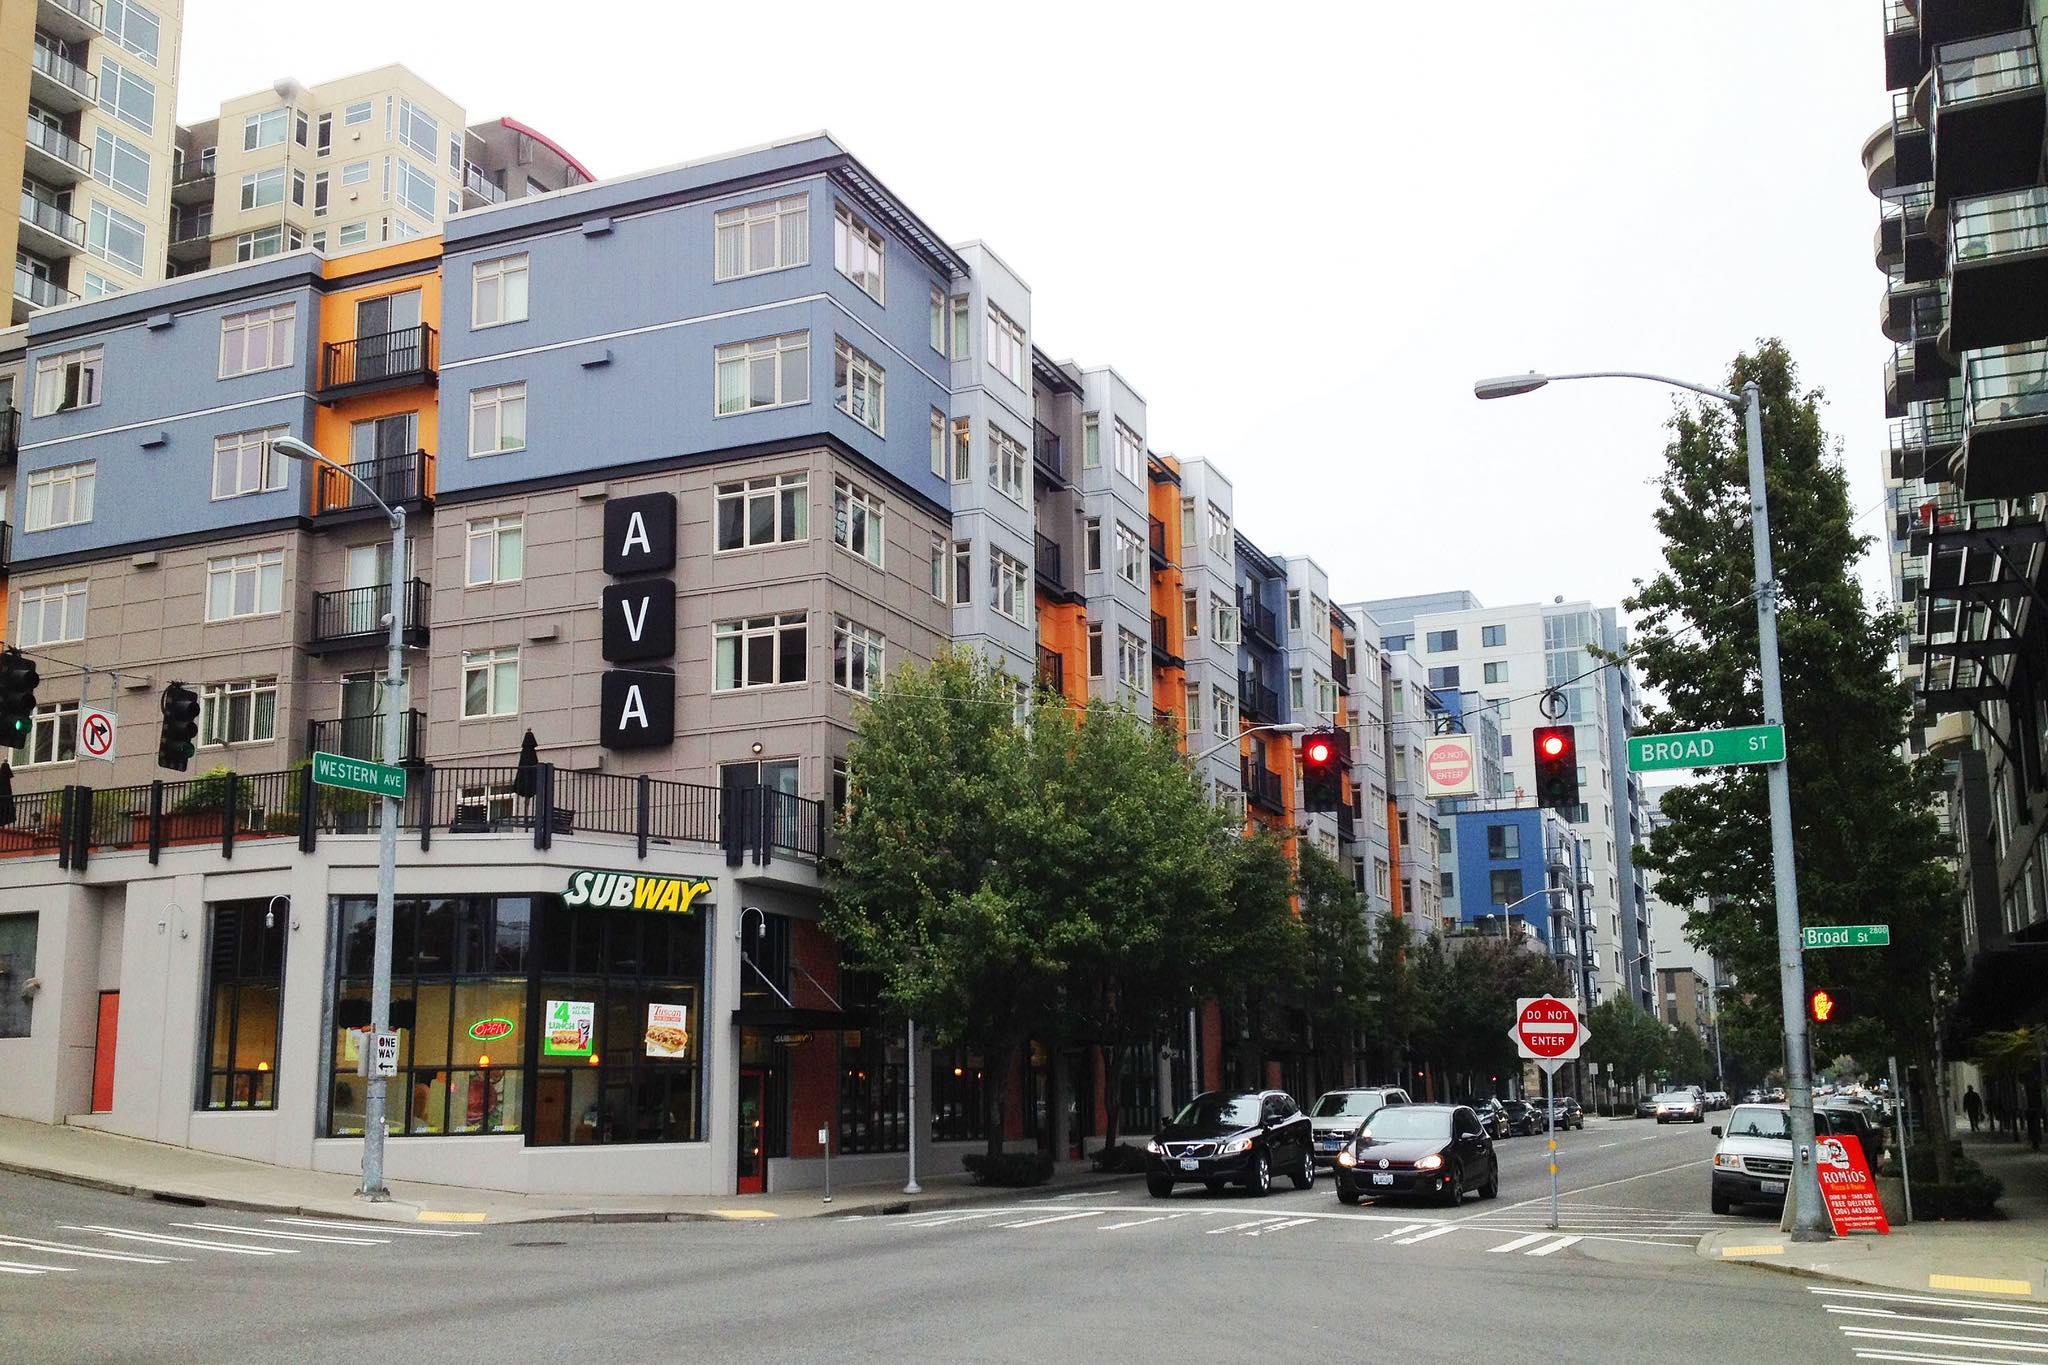 Housing report leak: too tempting not to look | Crosscut